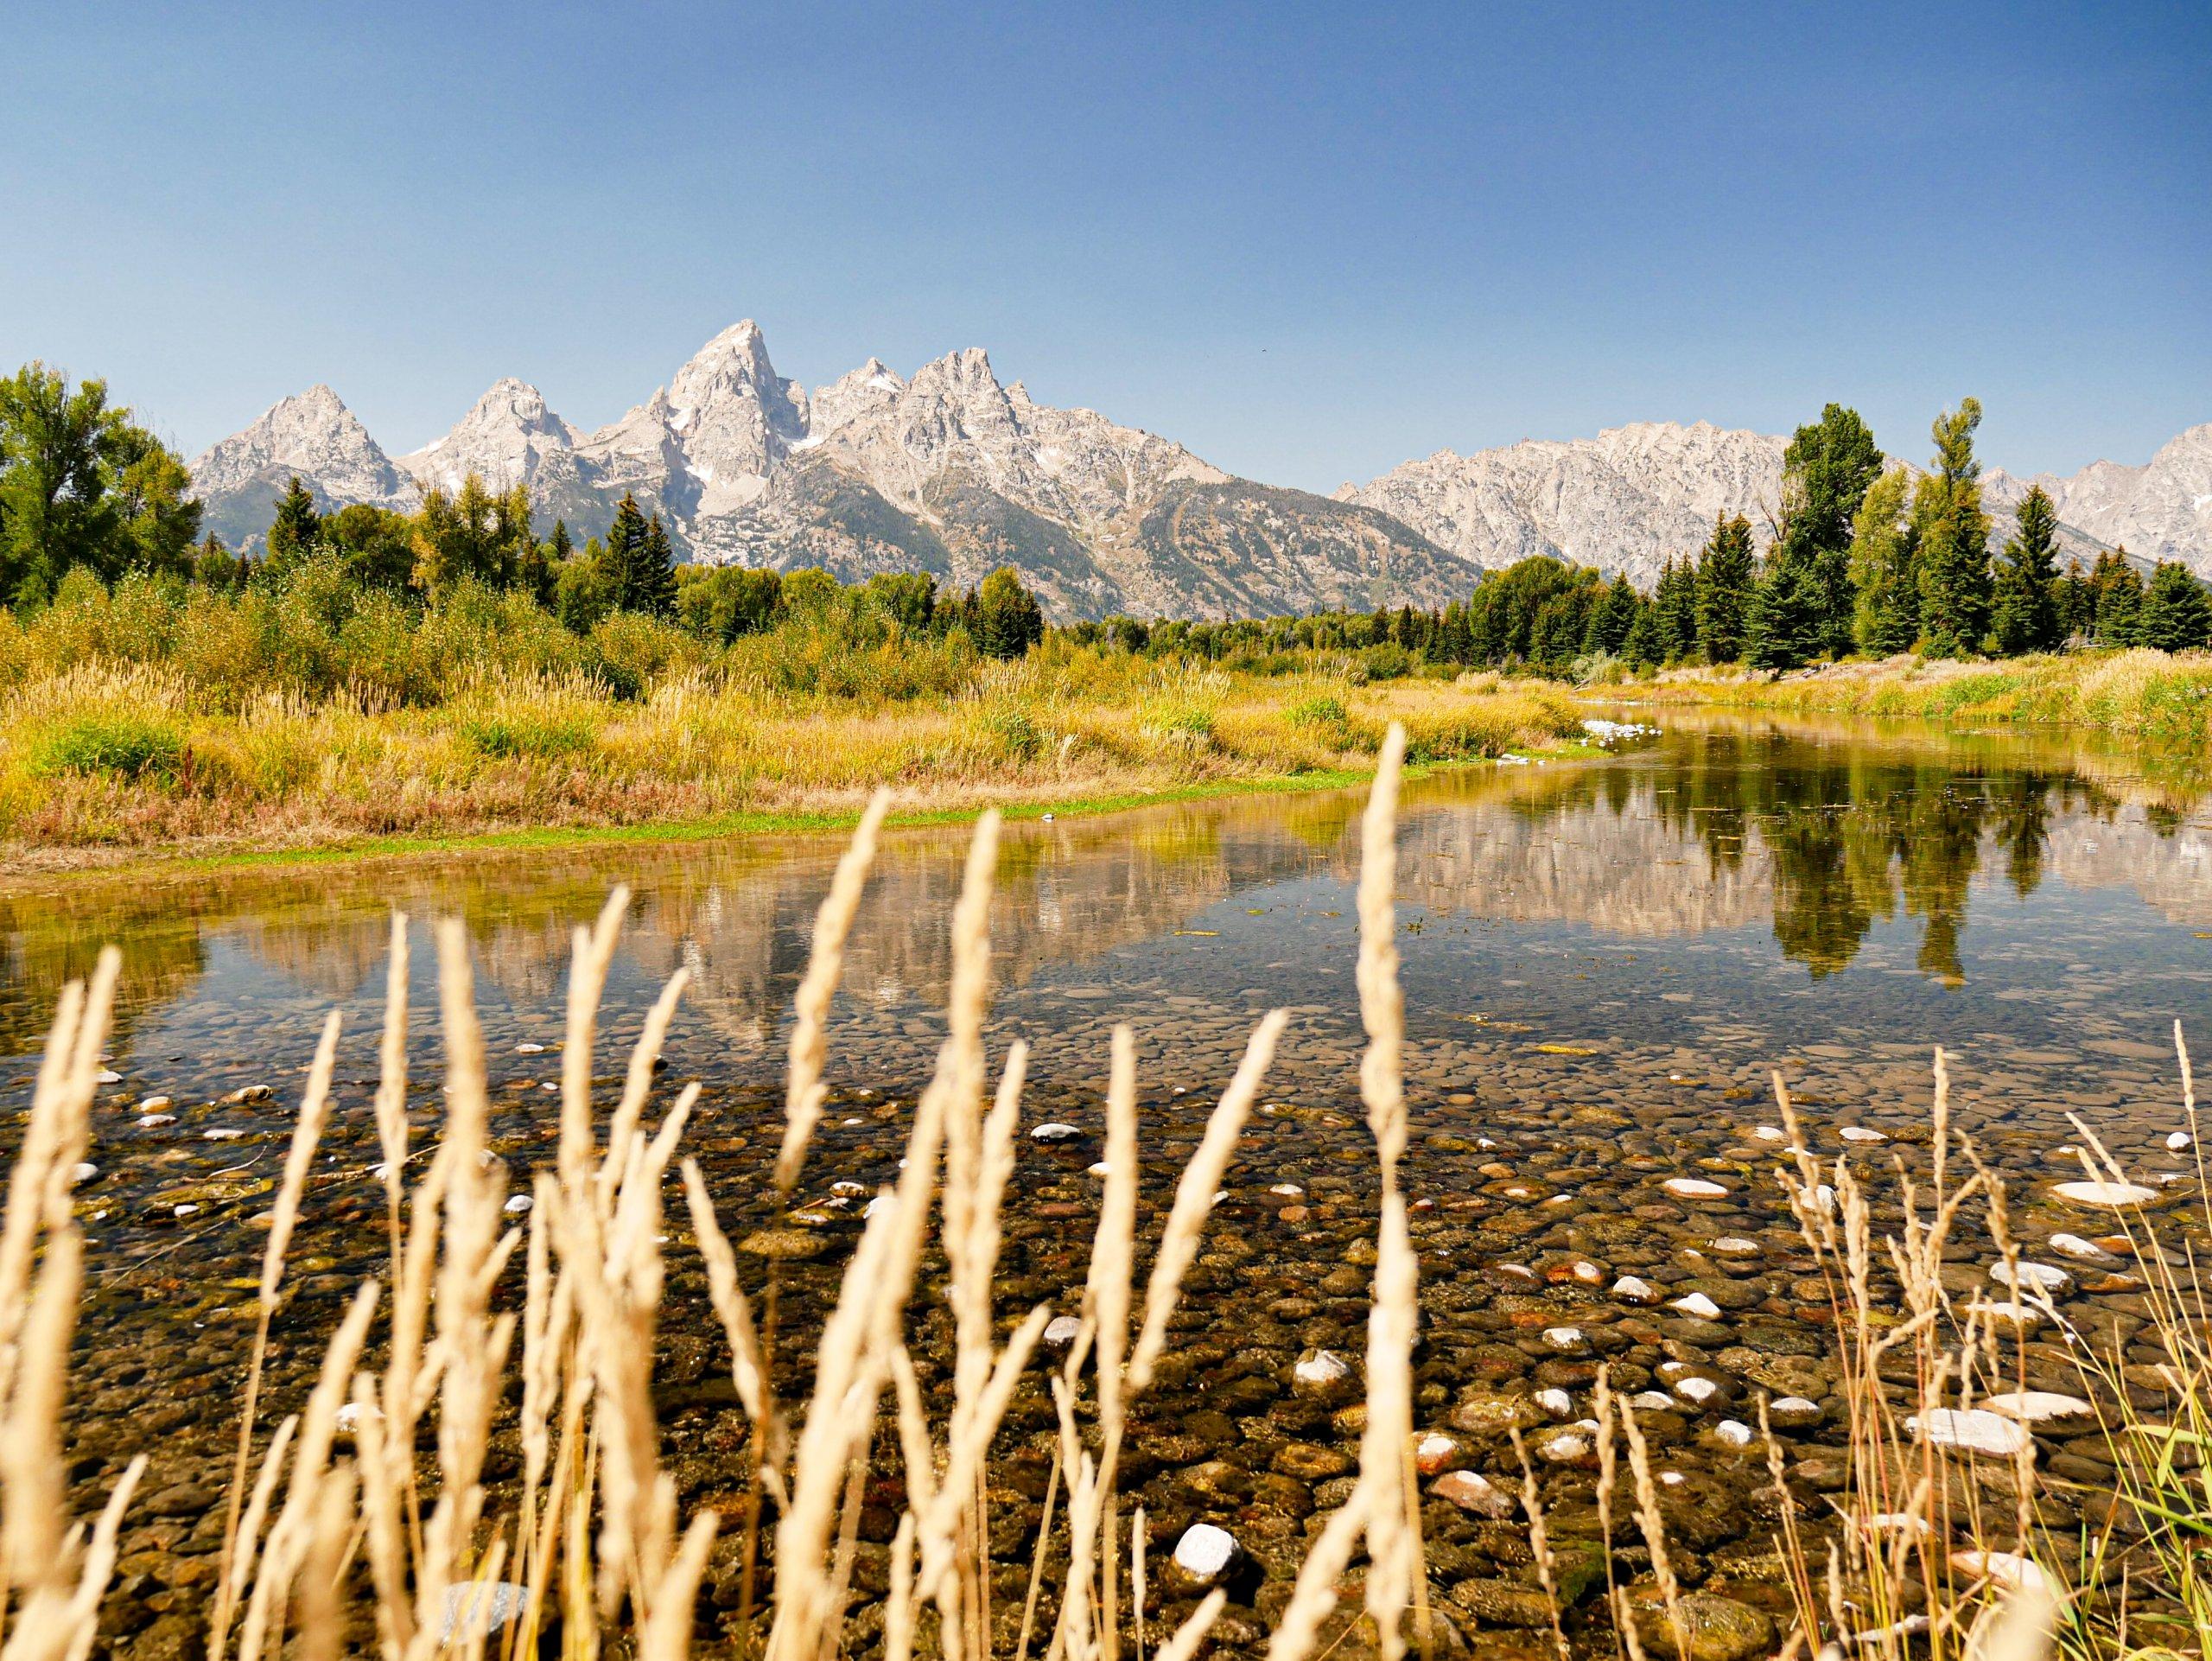 Grand Teton, Yellowstone & Glacier National Park Road Trip